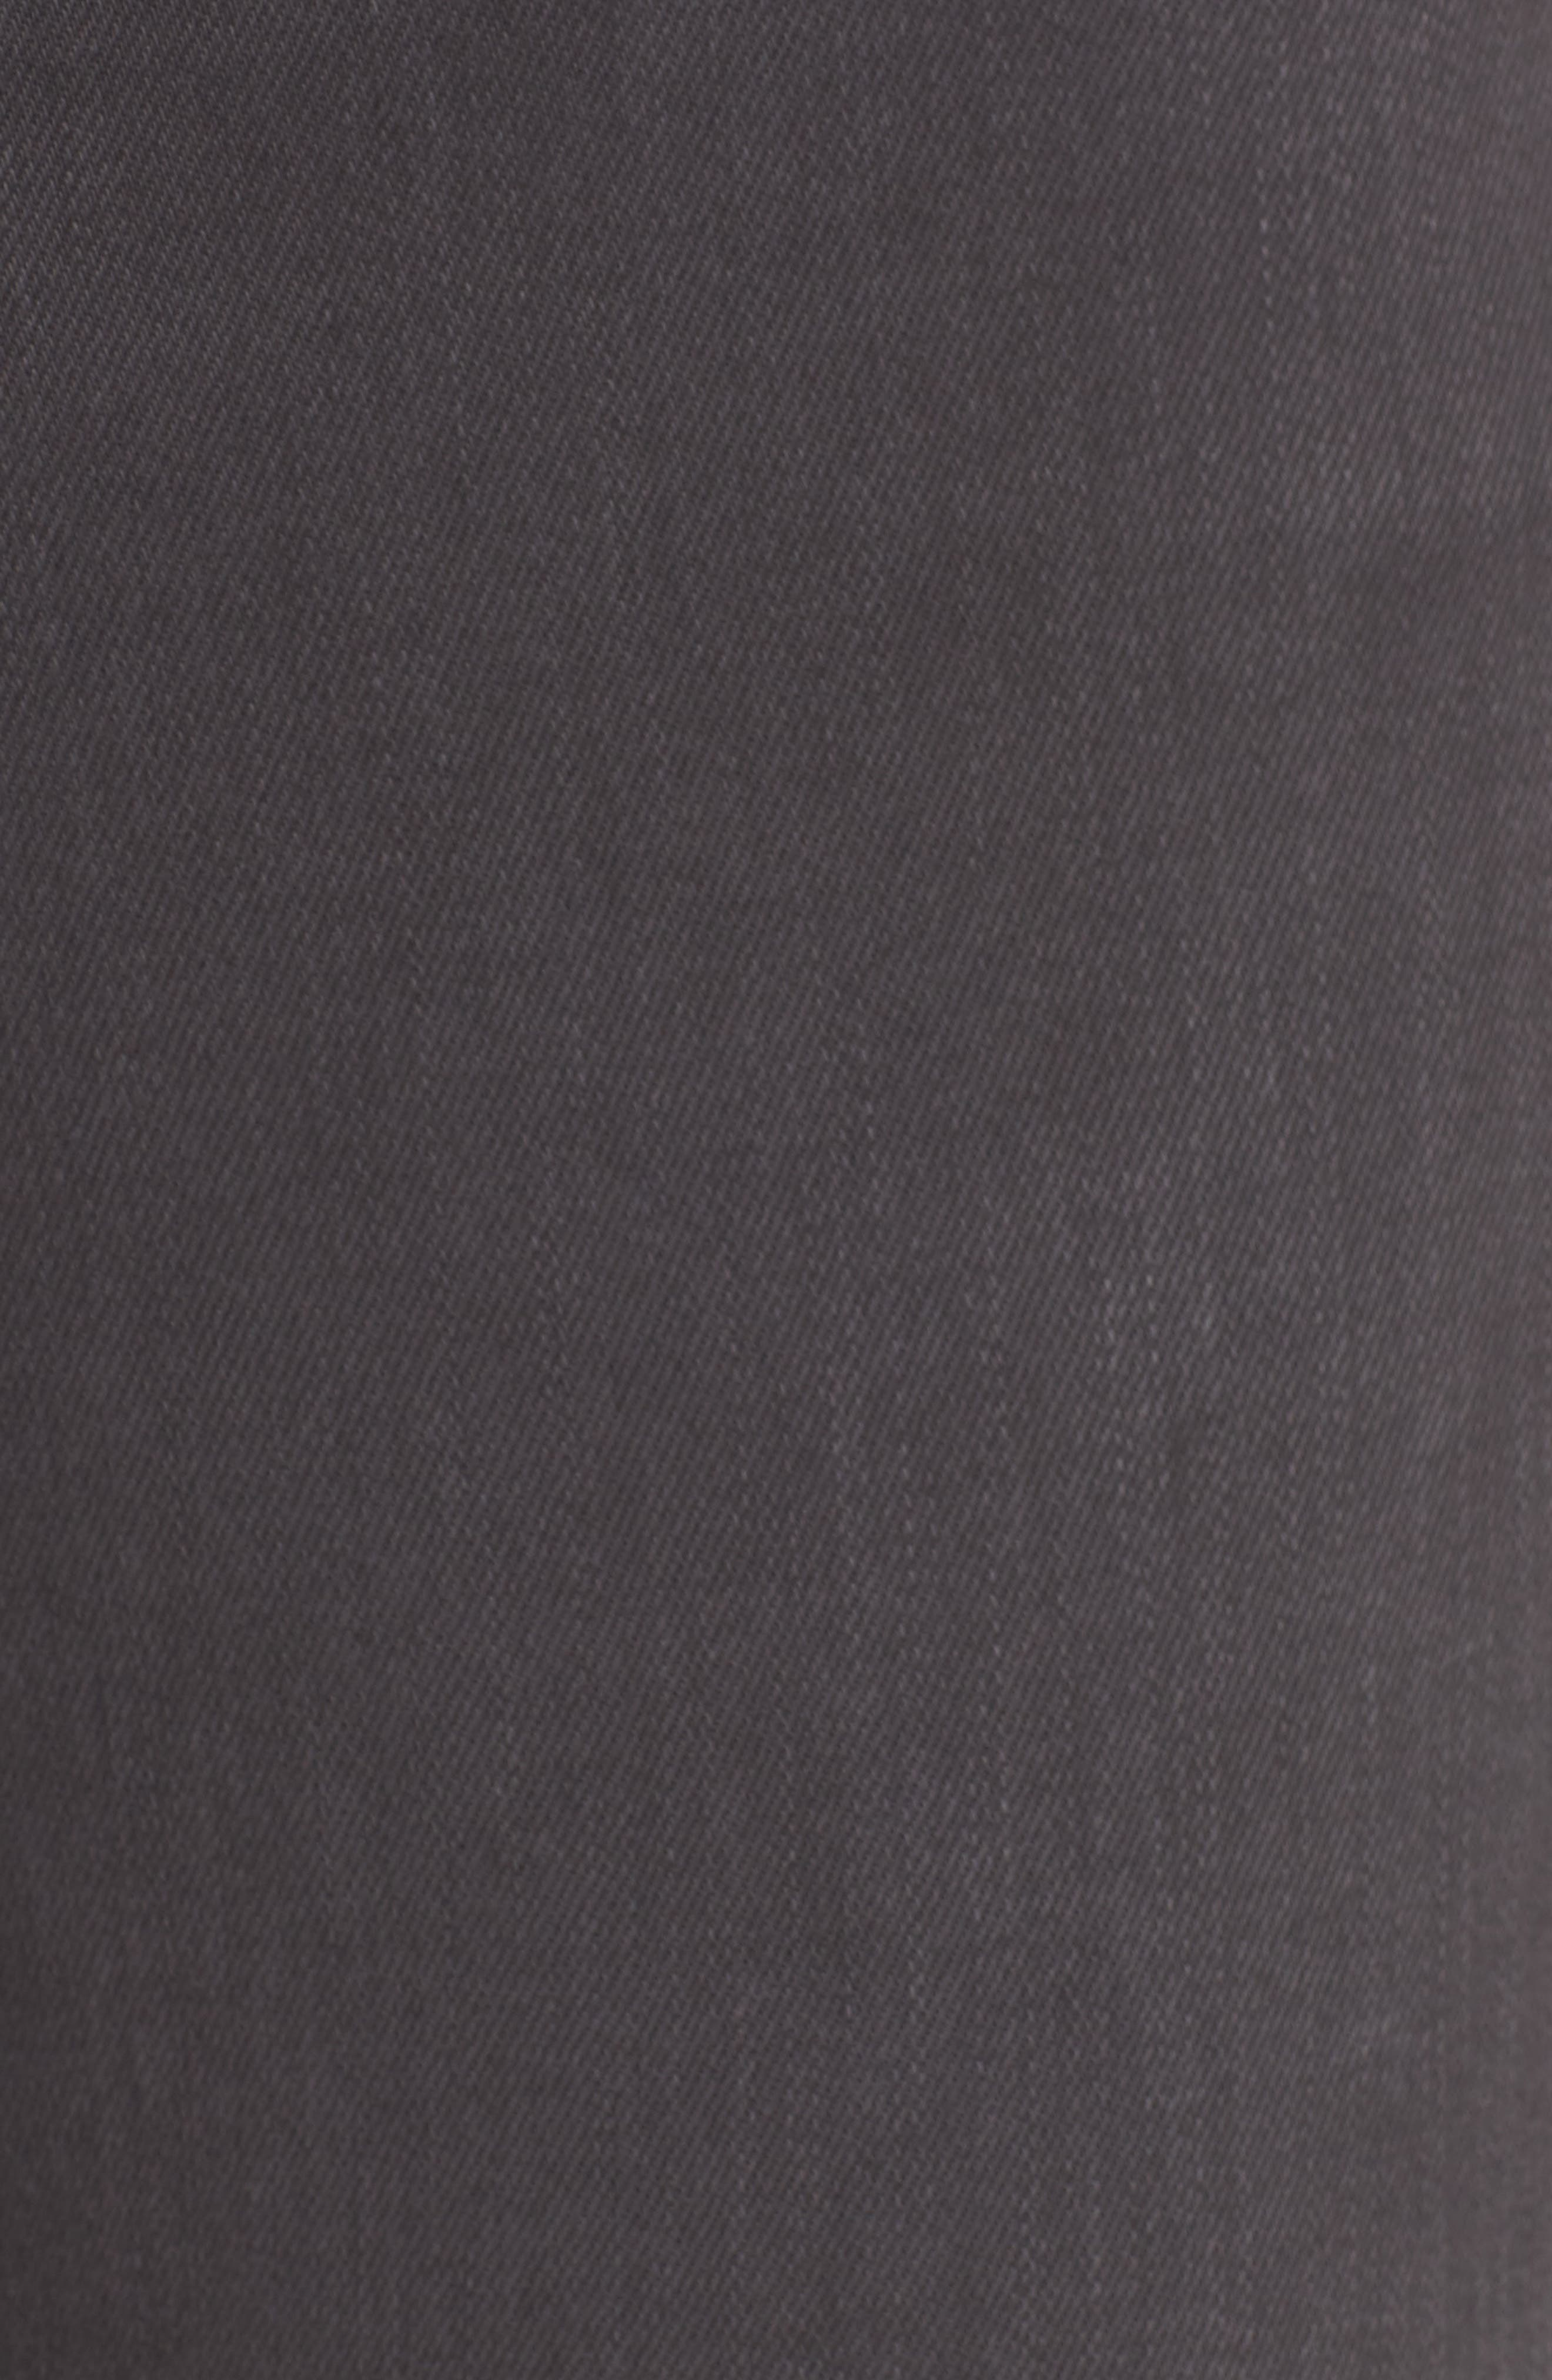 Mila High Rise Skinny Jeans,                             Alternate thumbnail 5, color,                             Interstellar Black